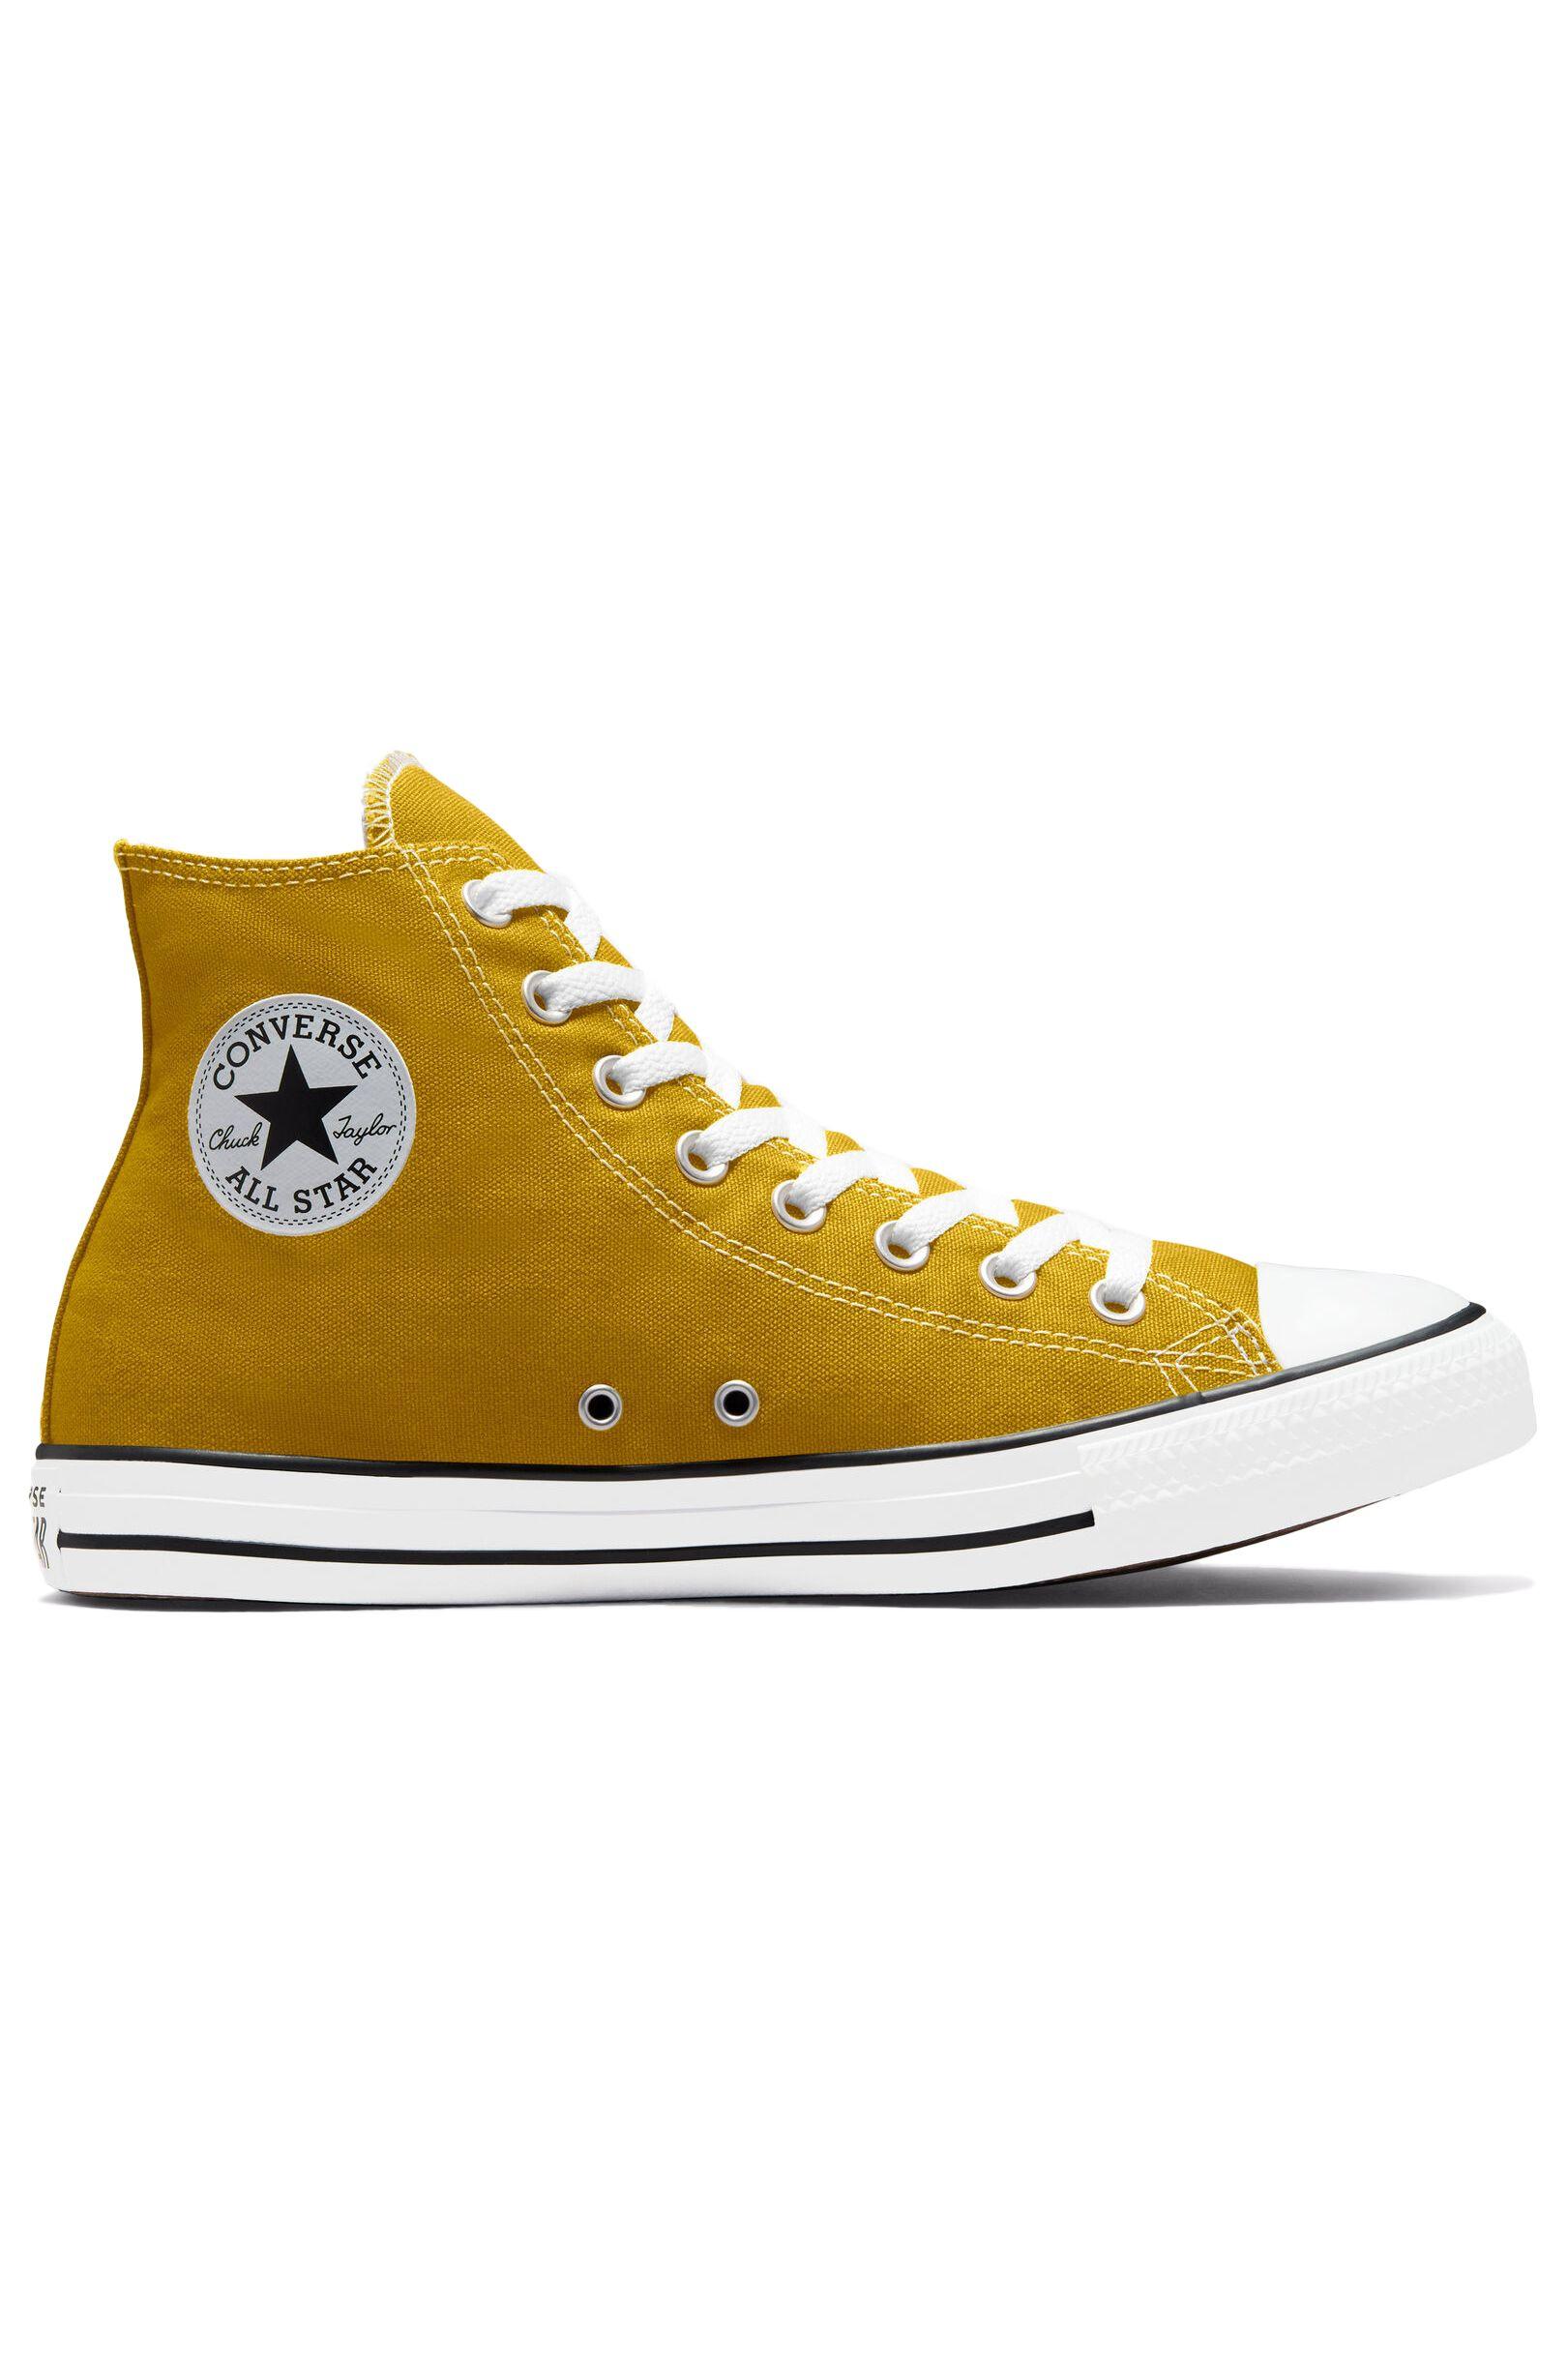 Converse Shoes CHUCK TAYLOR ALL STAR HI Dark Citron